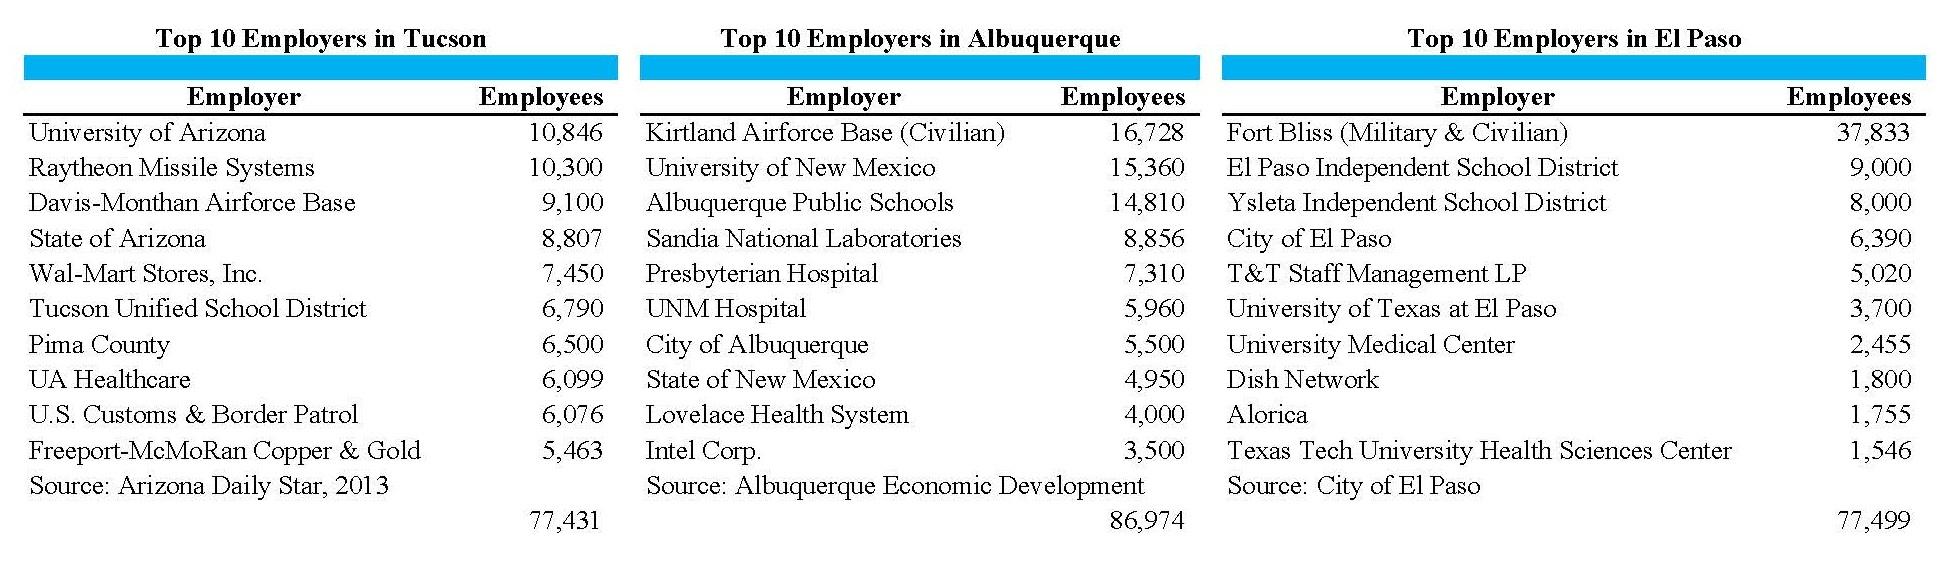 Tale Top Employers